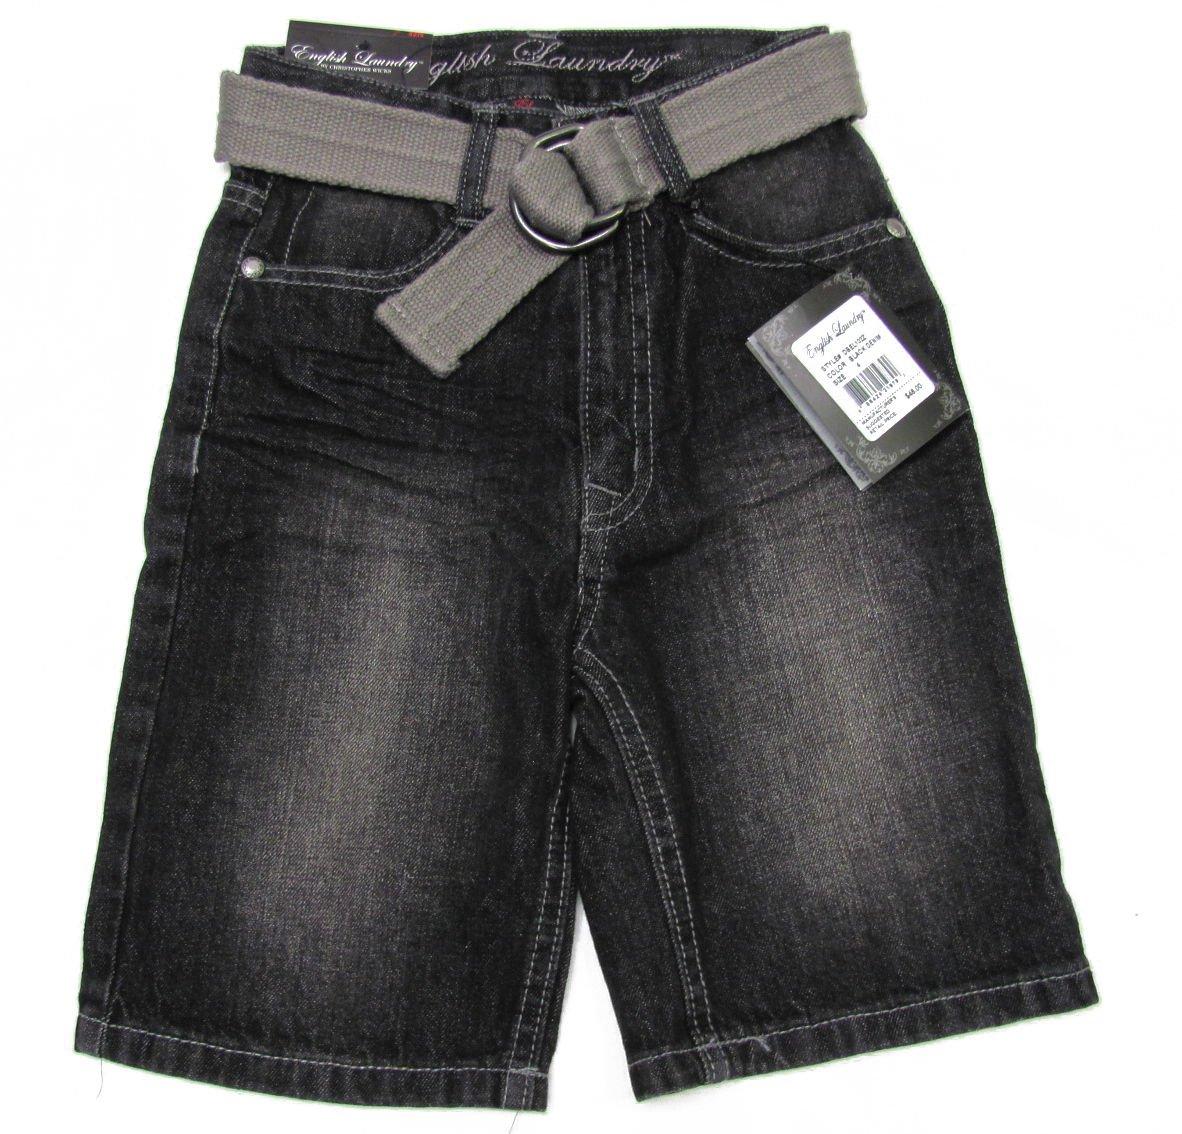 English Laundry Boys size 10 Black Jean Shorts with Belt New